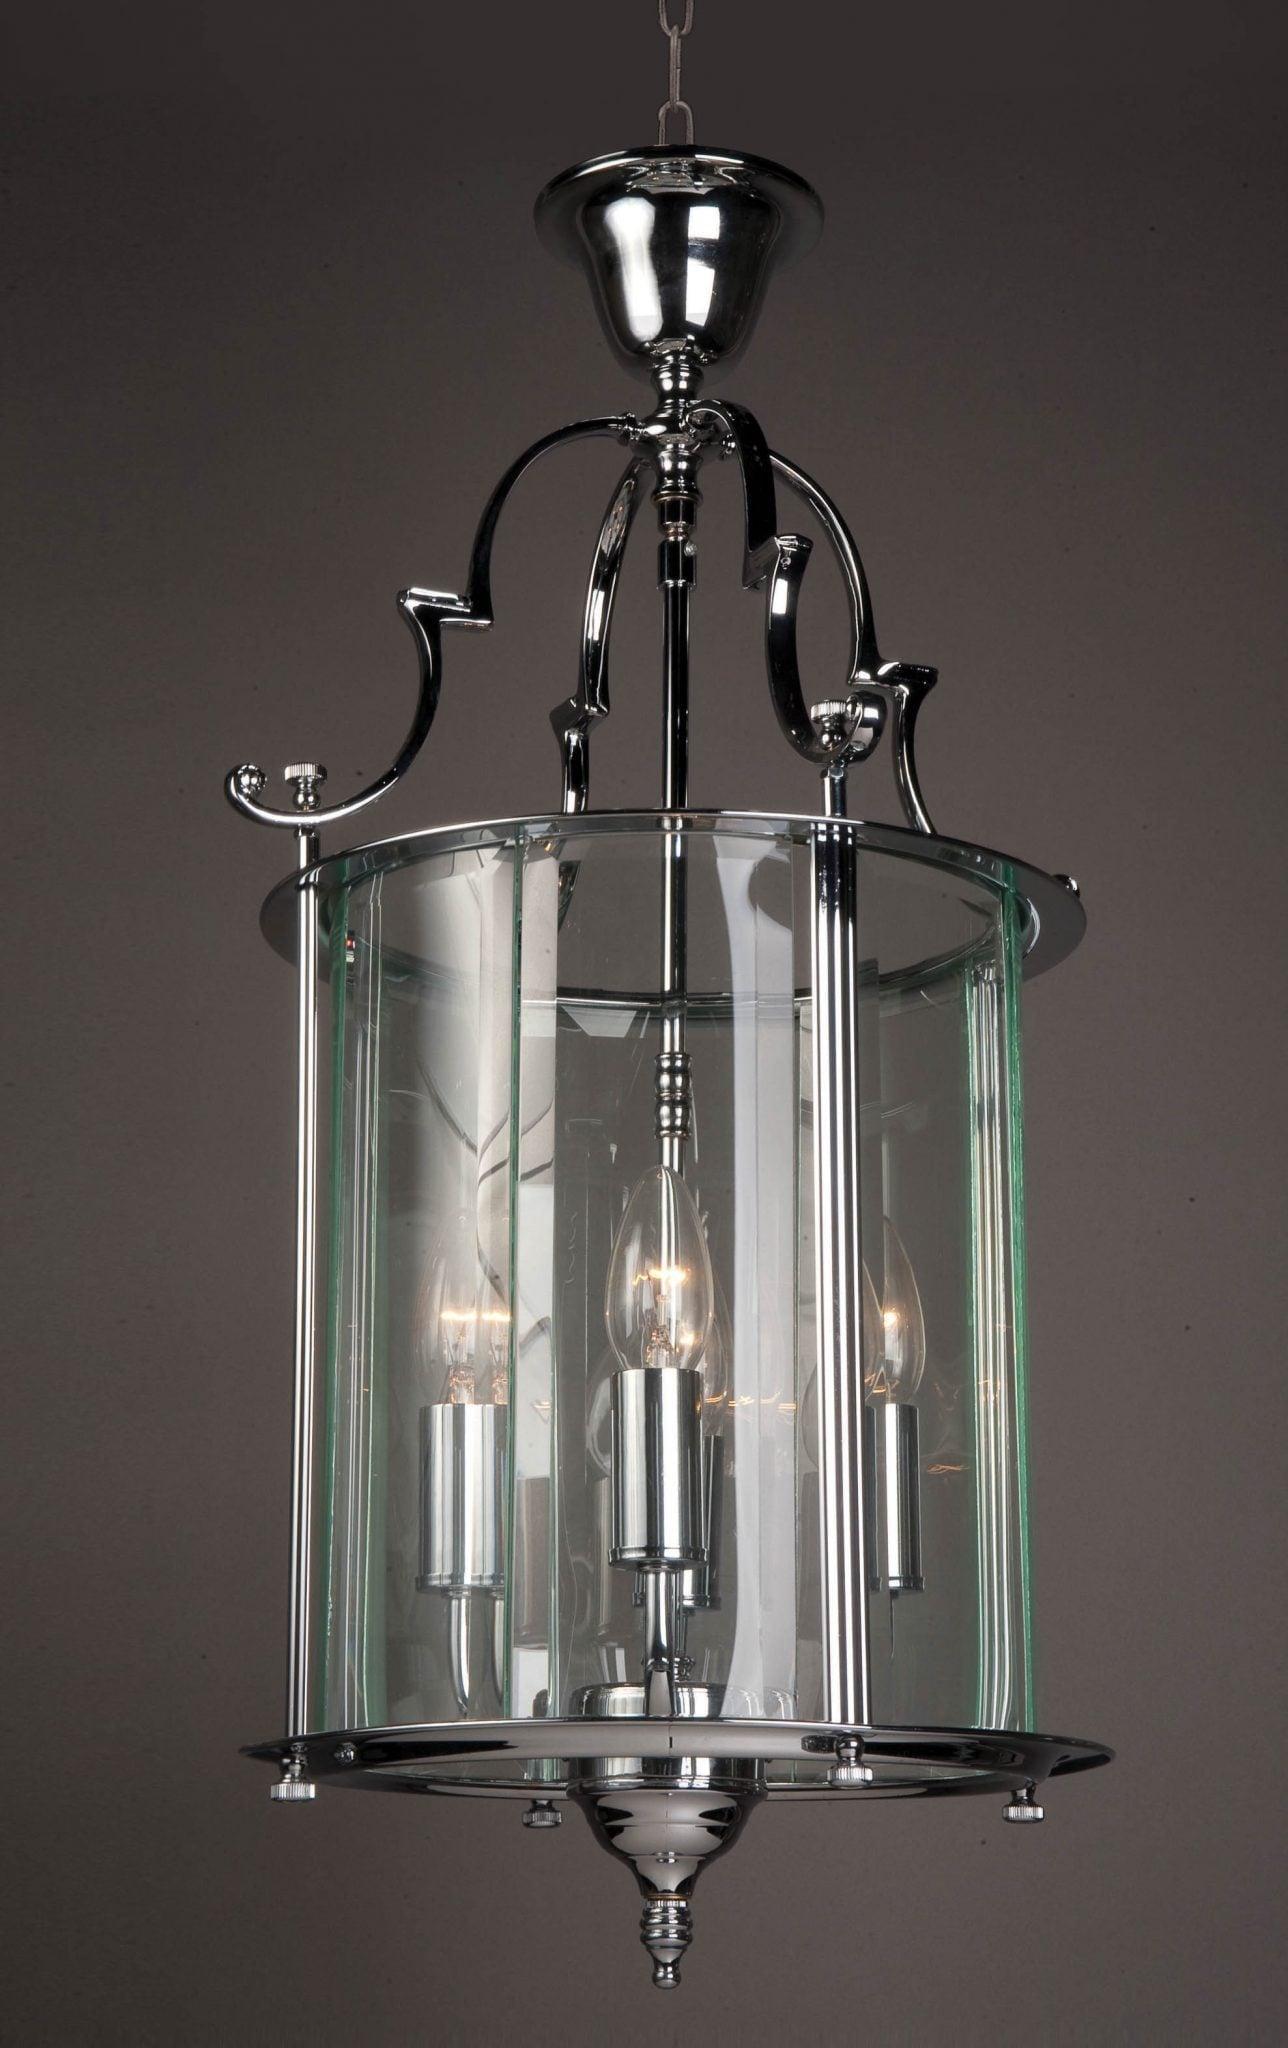 Impex LG07000/11/CH Colchester 4 light Lantern, Chrome